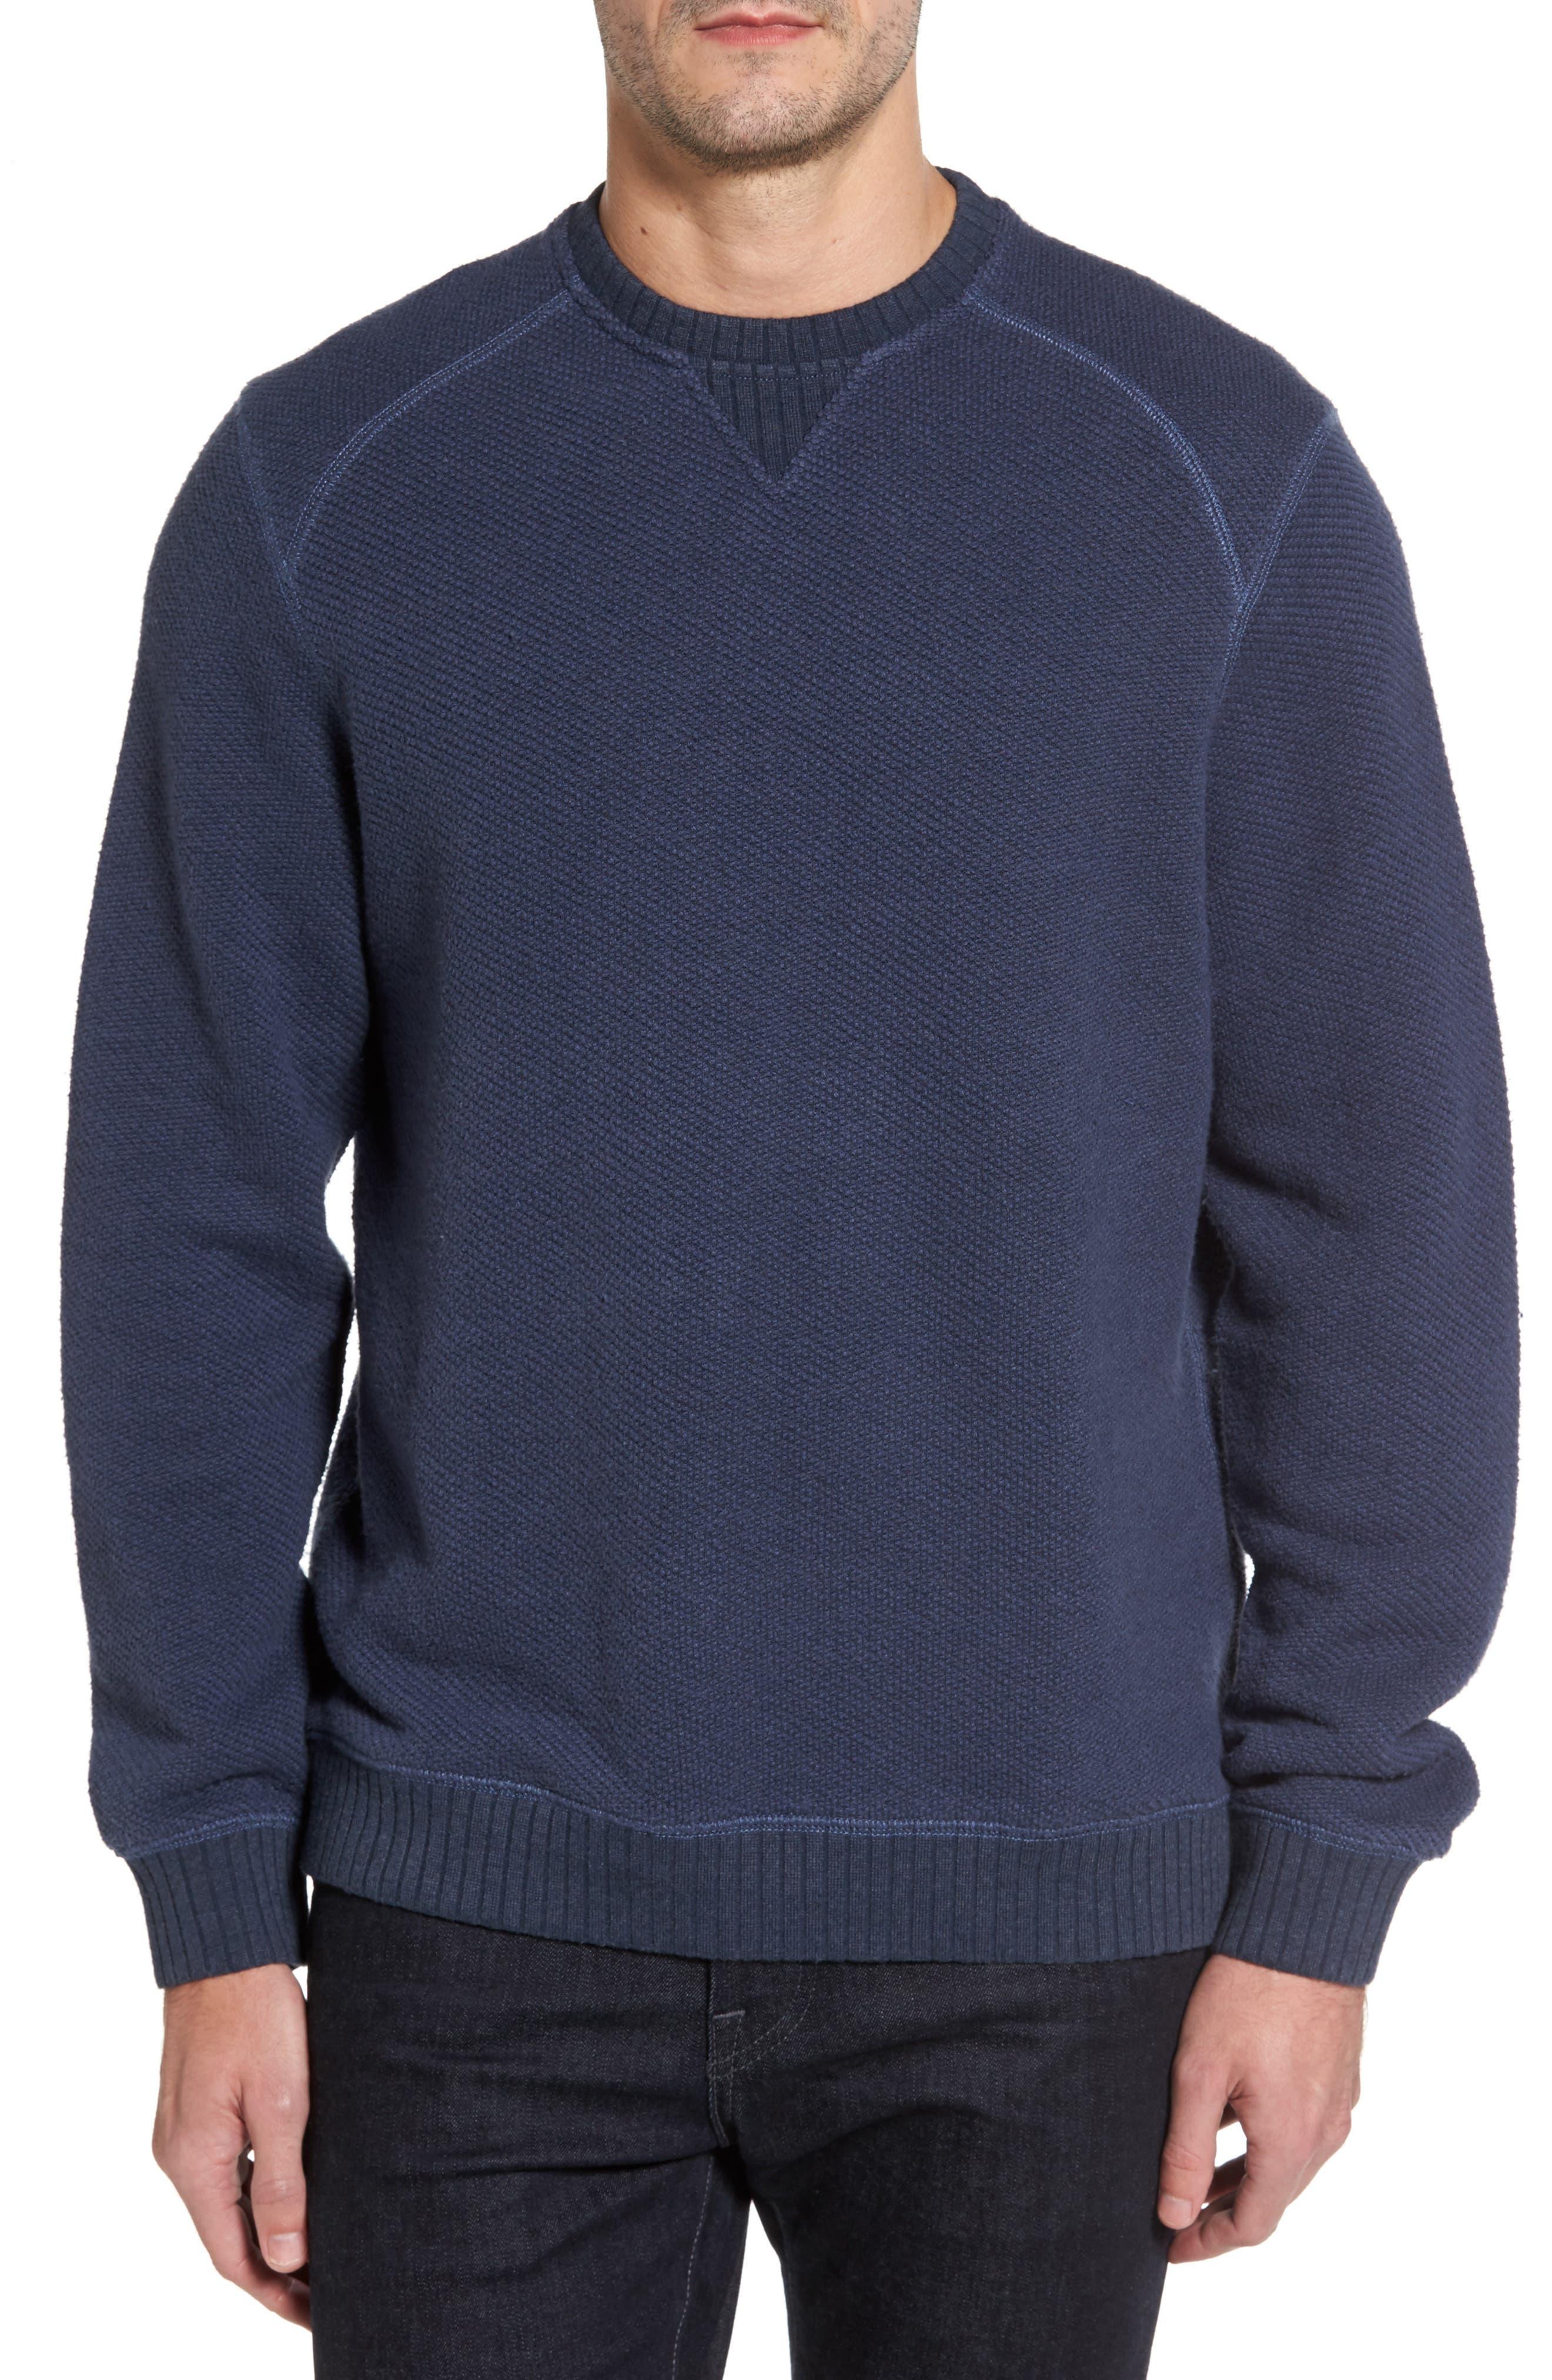 Surfari Crewneck Sweatshirt,                             Main thumbnail 1, color,                             001